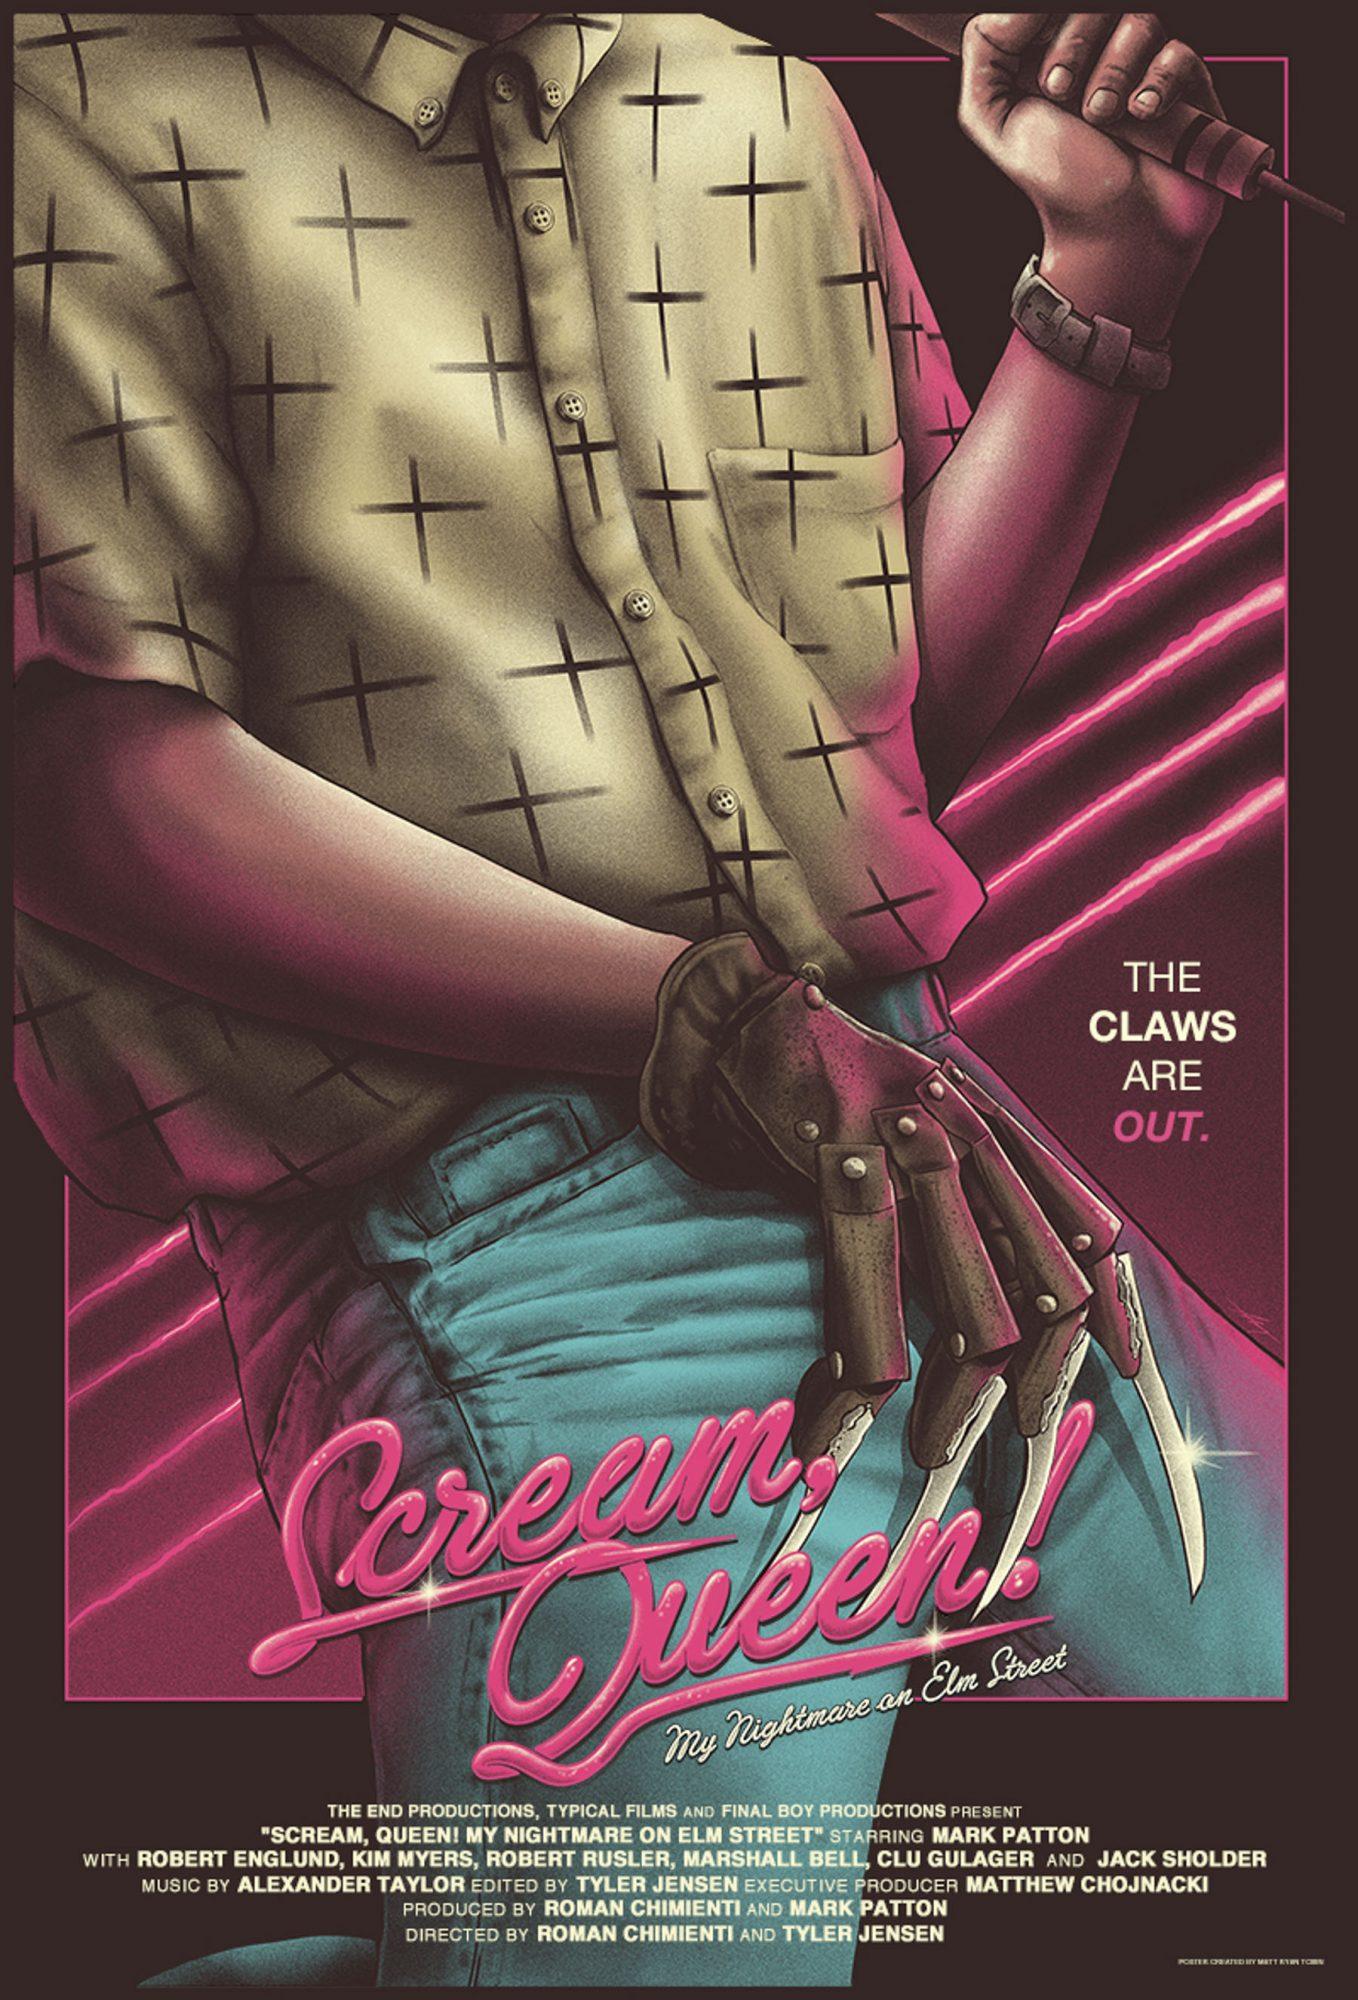 Scream Queen poster CR: Matt Ryan Tobin/The End Productions